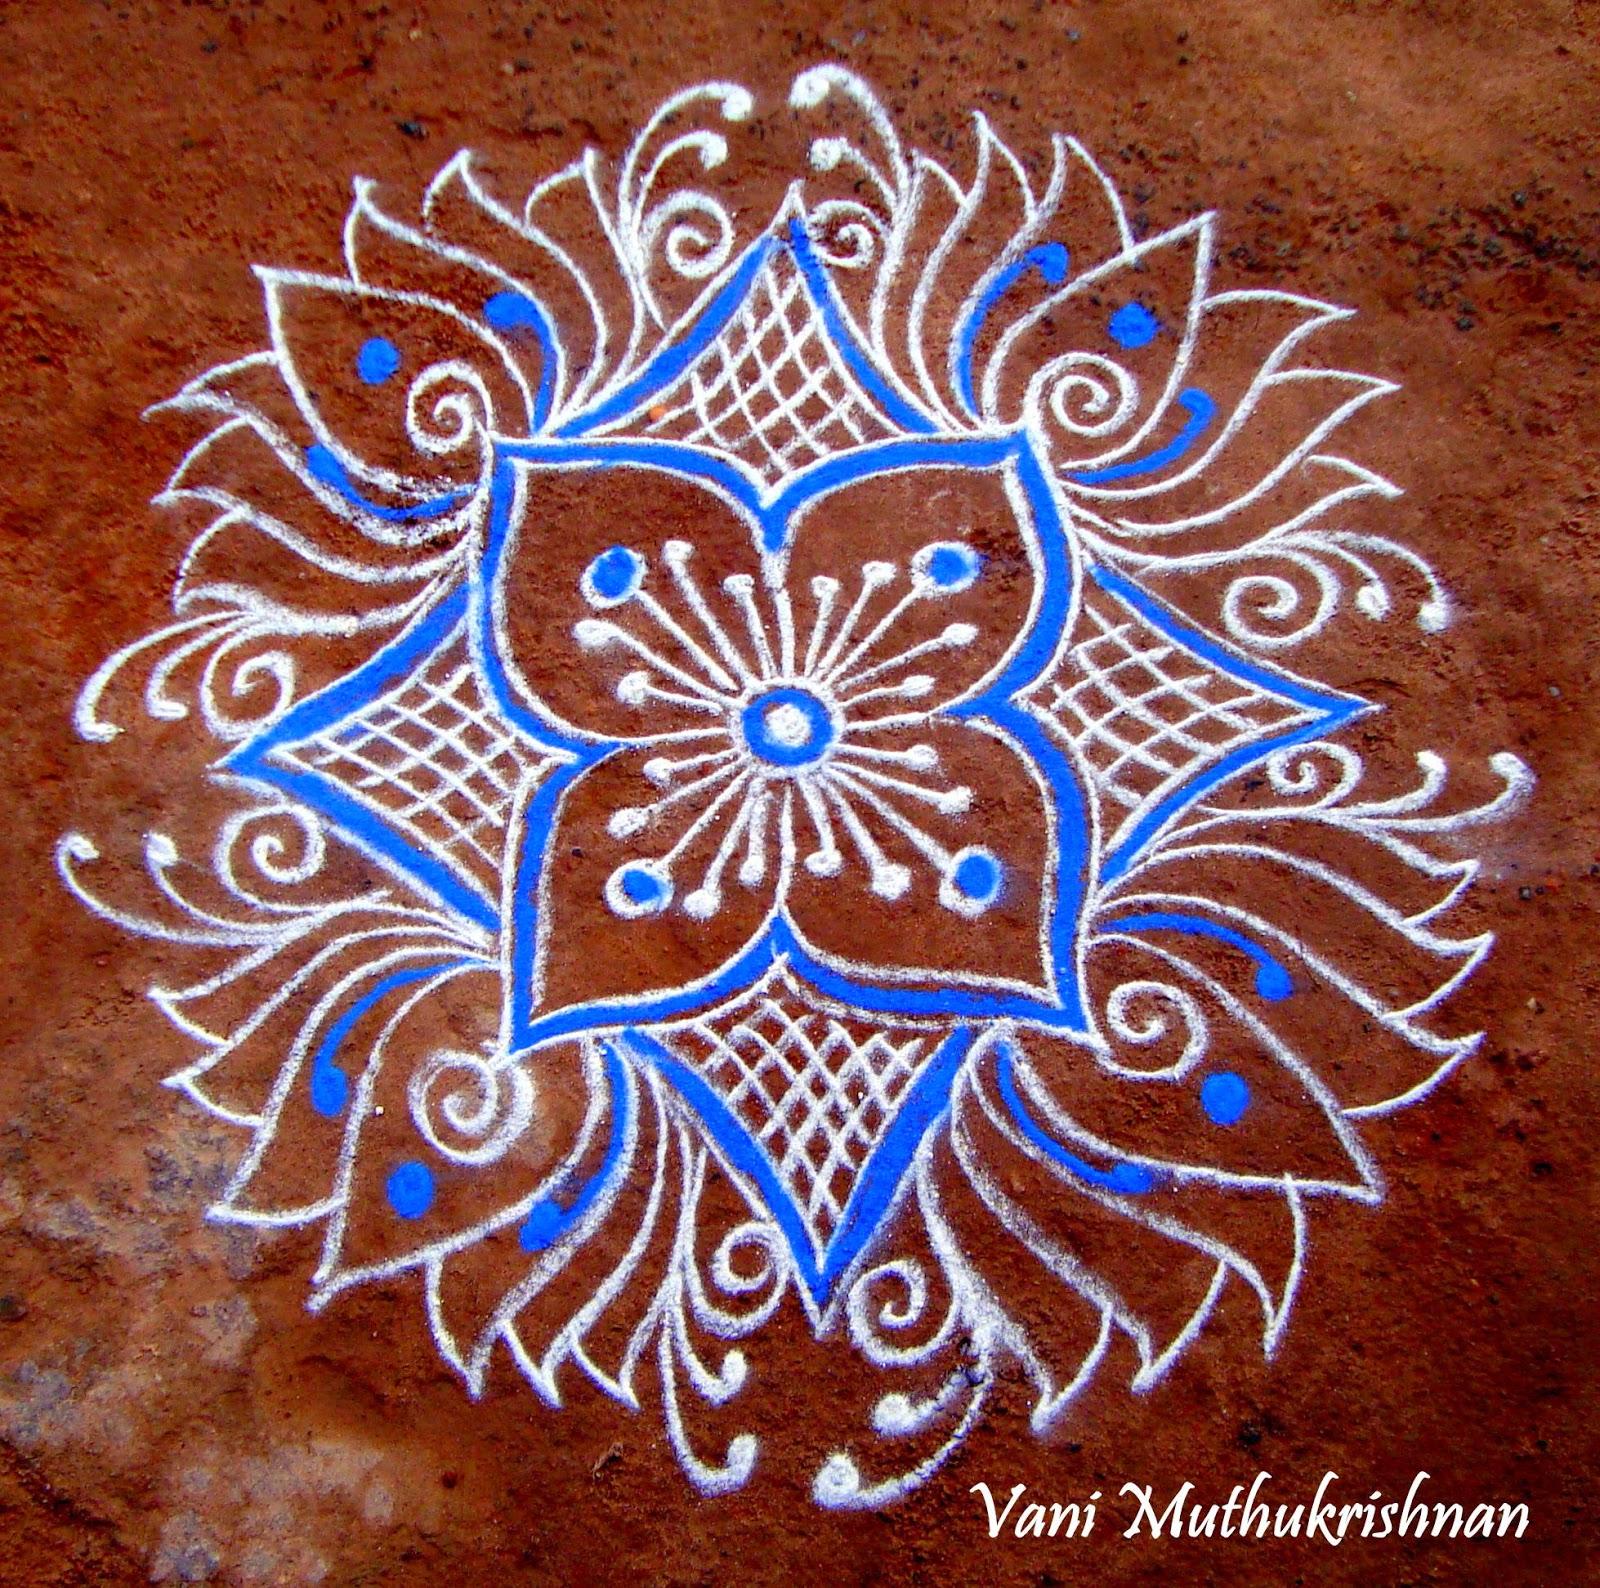 45 Kolam Designs For Festivals